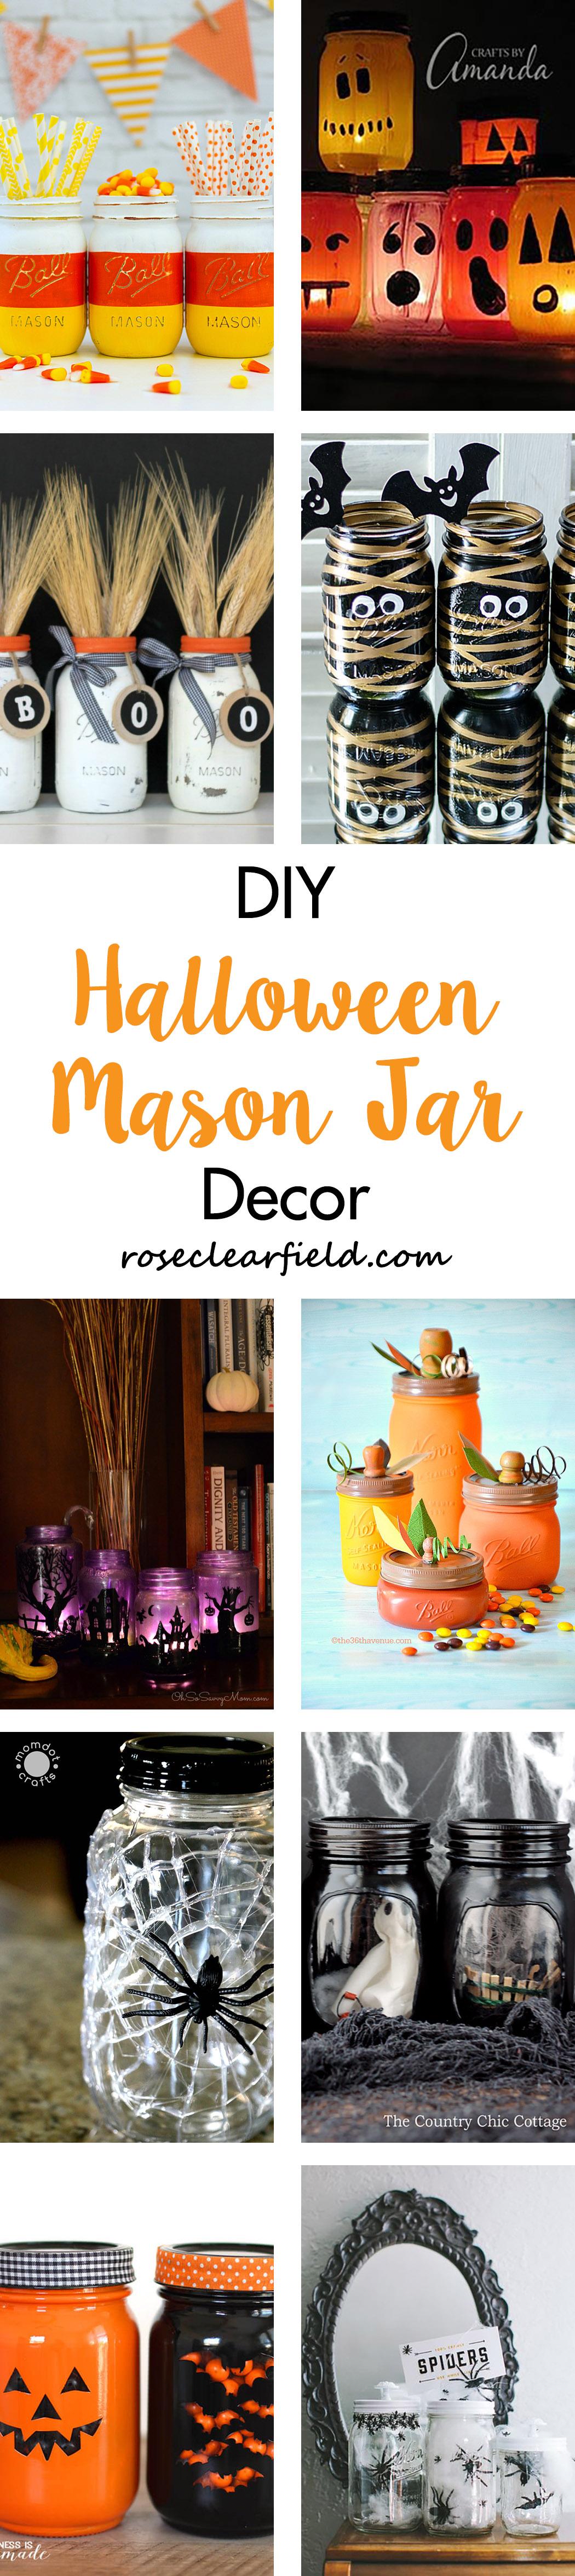 DIY Halloween Mason Jar Decor | http://www.roseclearfield.com